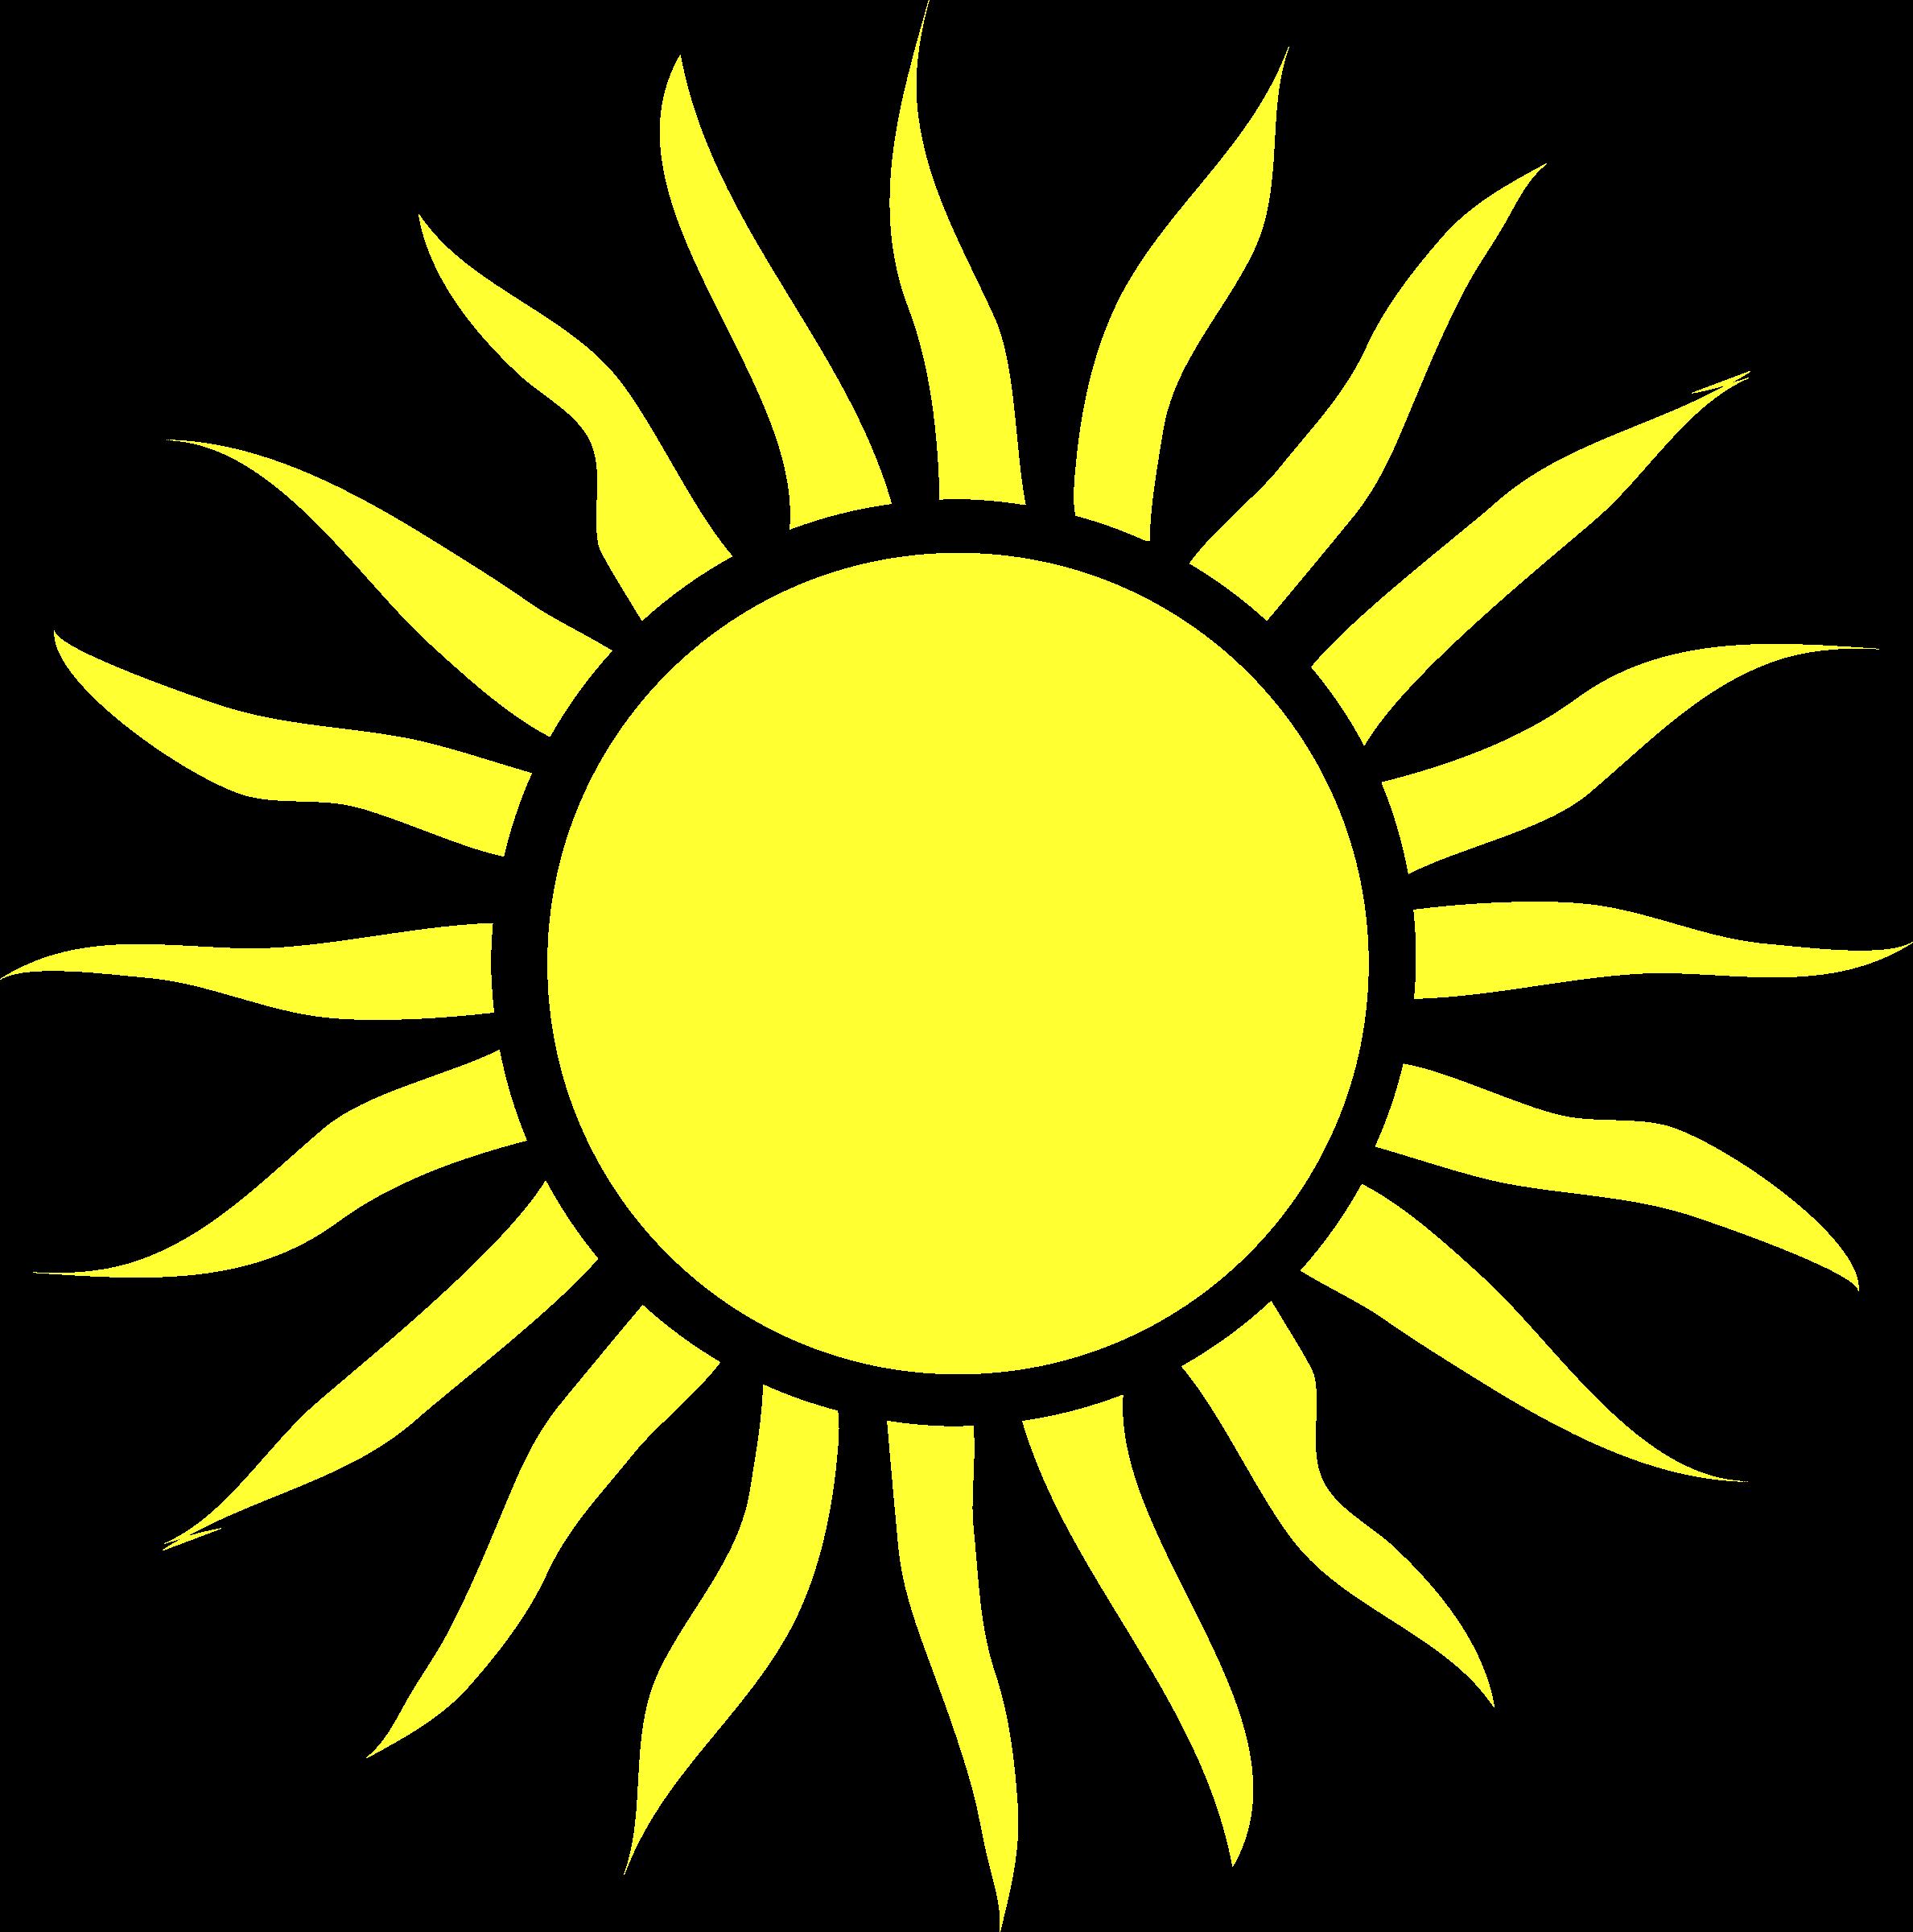 Clipart - Blazing sun 2 library